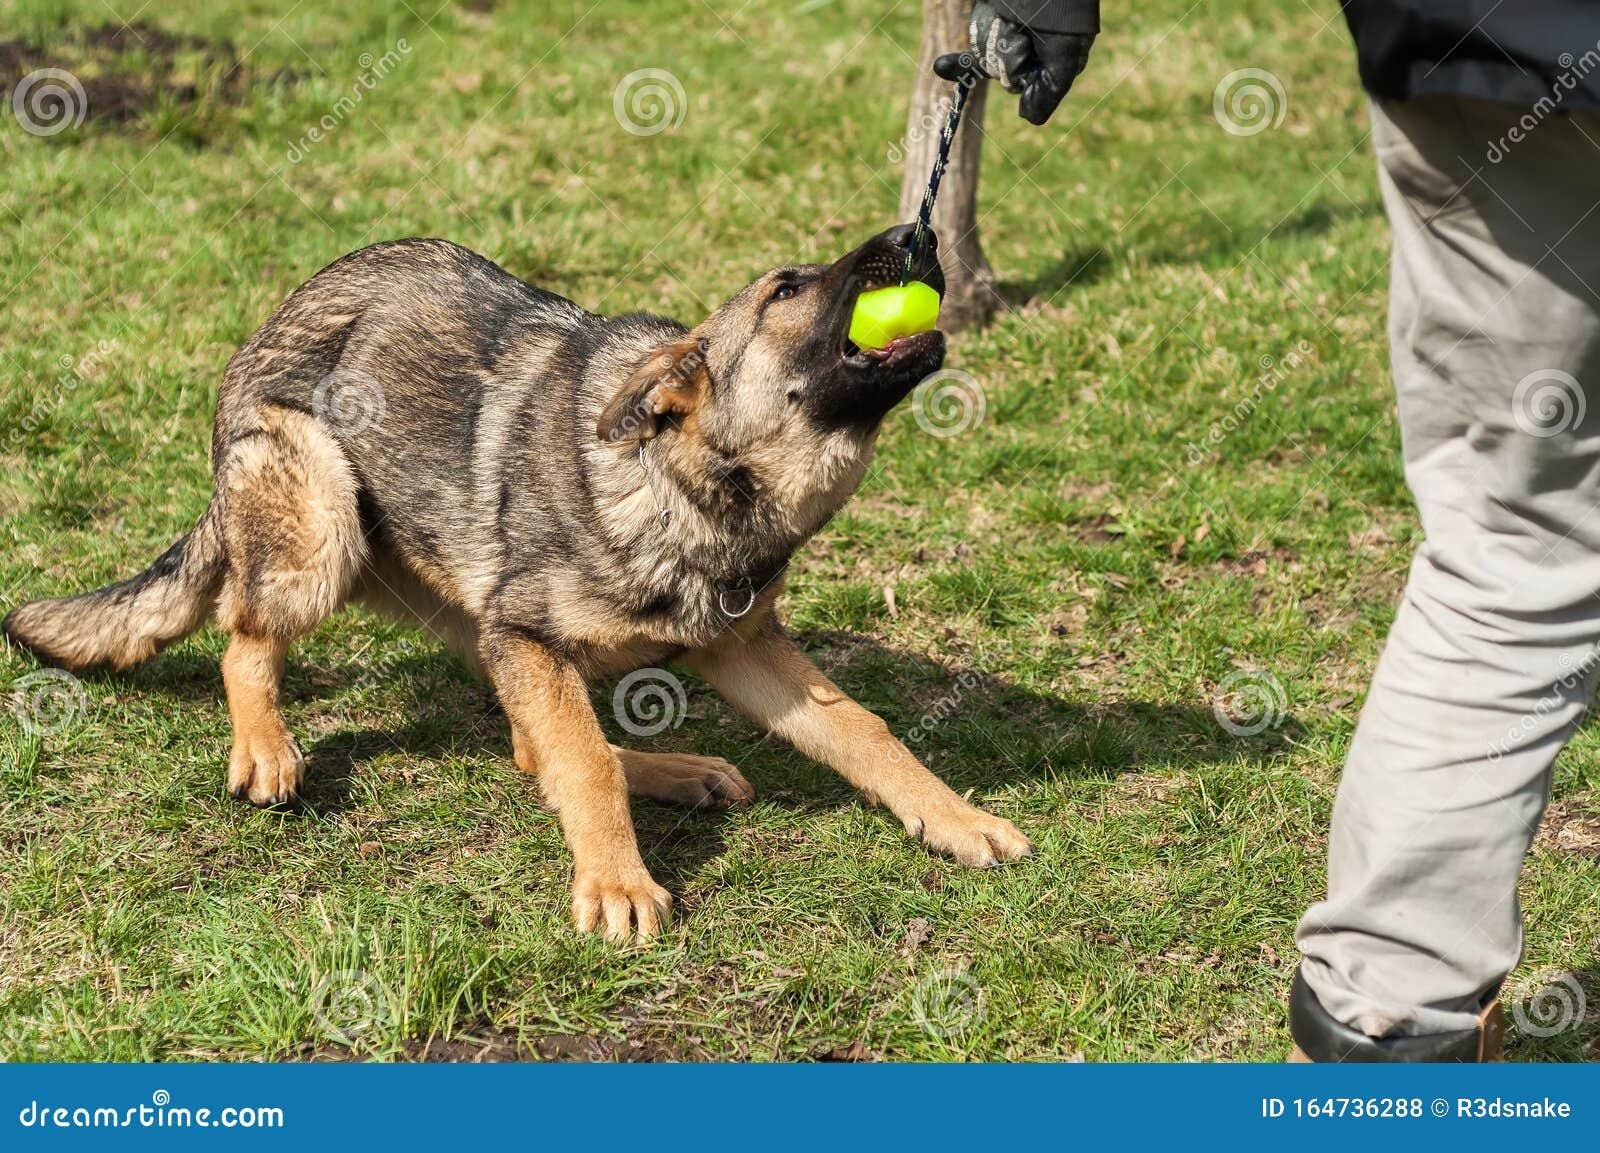 German Shepherd Puppy Training With A Ball Stock Photo Image Of Pedigree Black 164736288